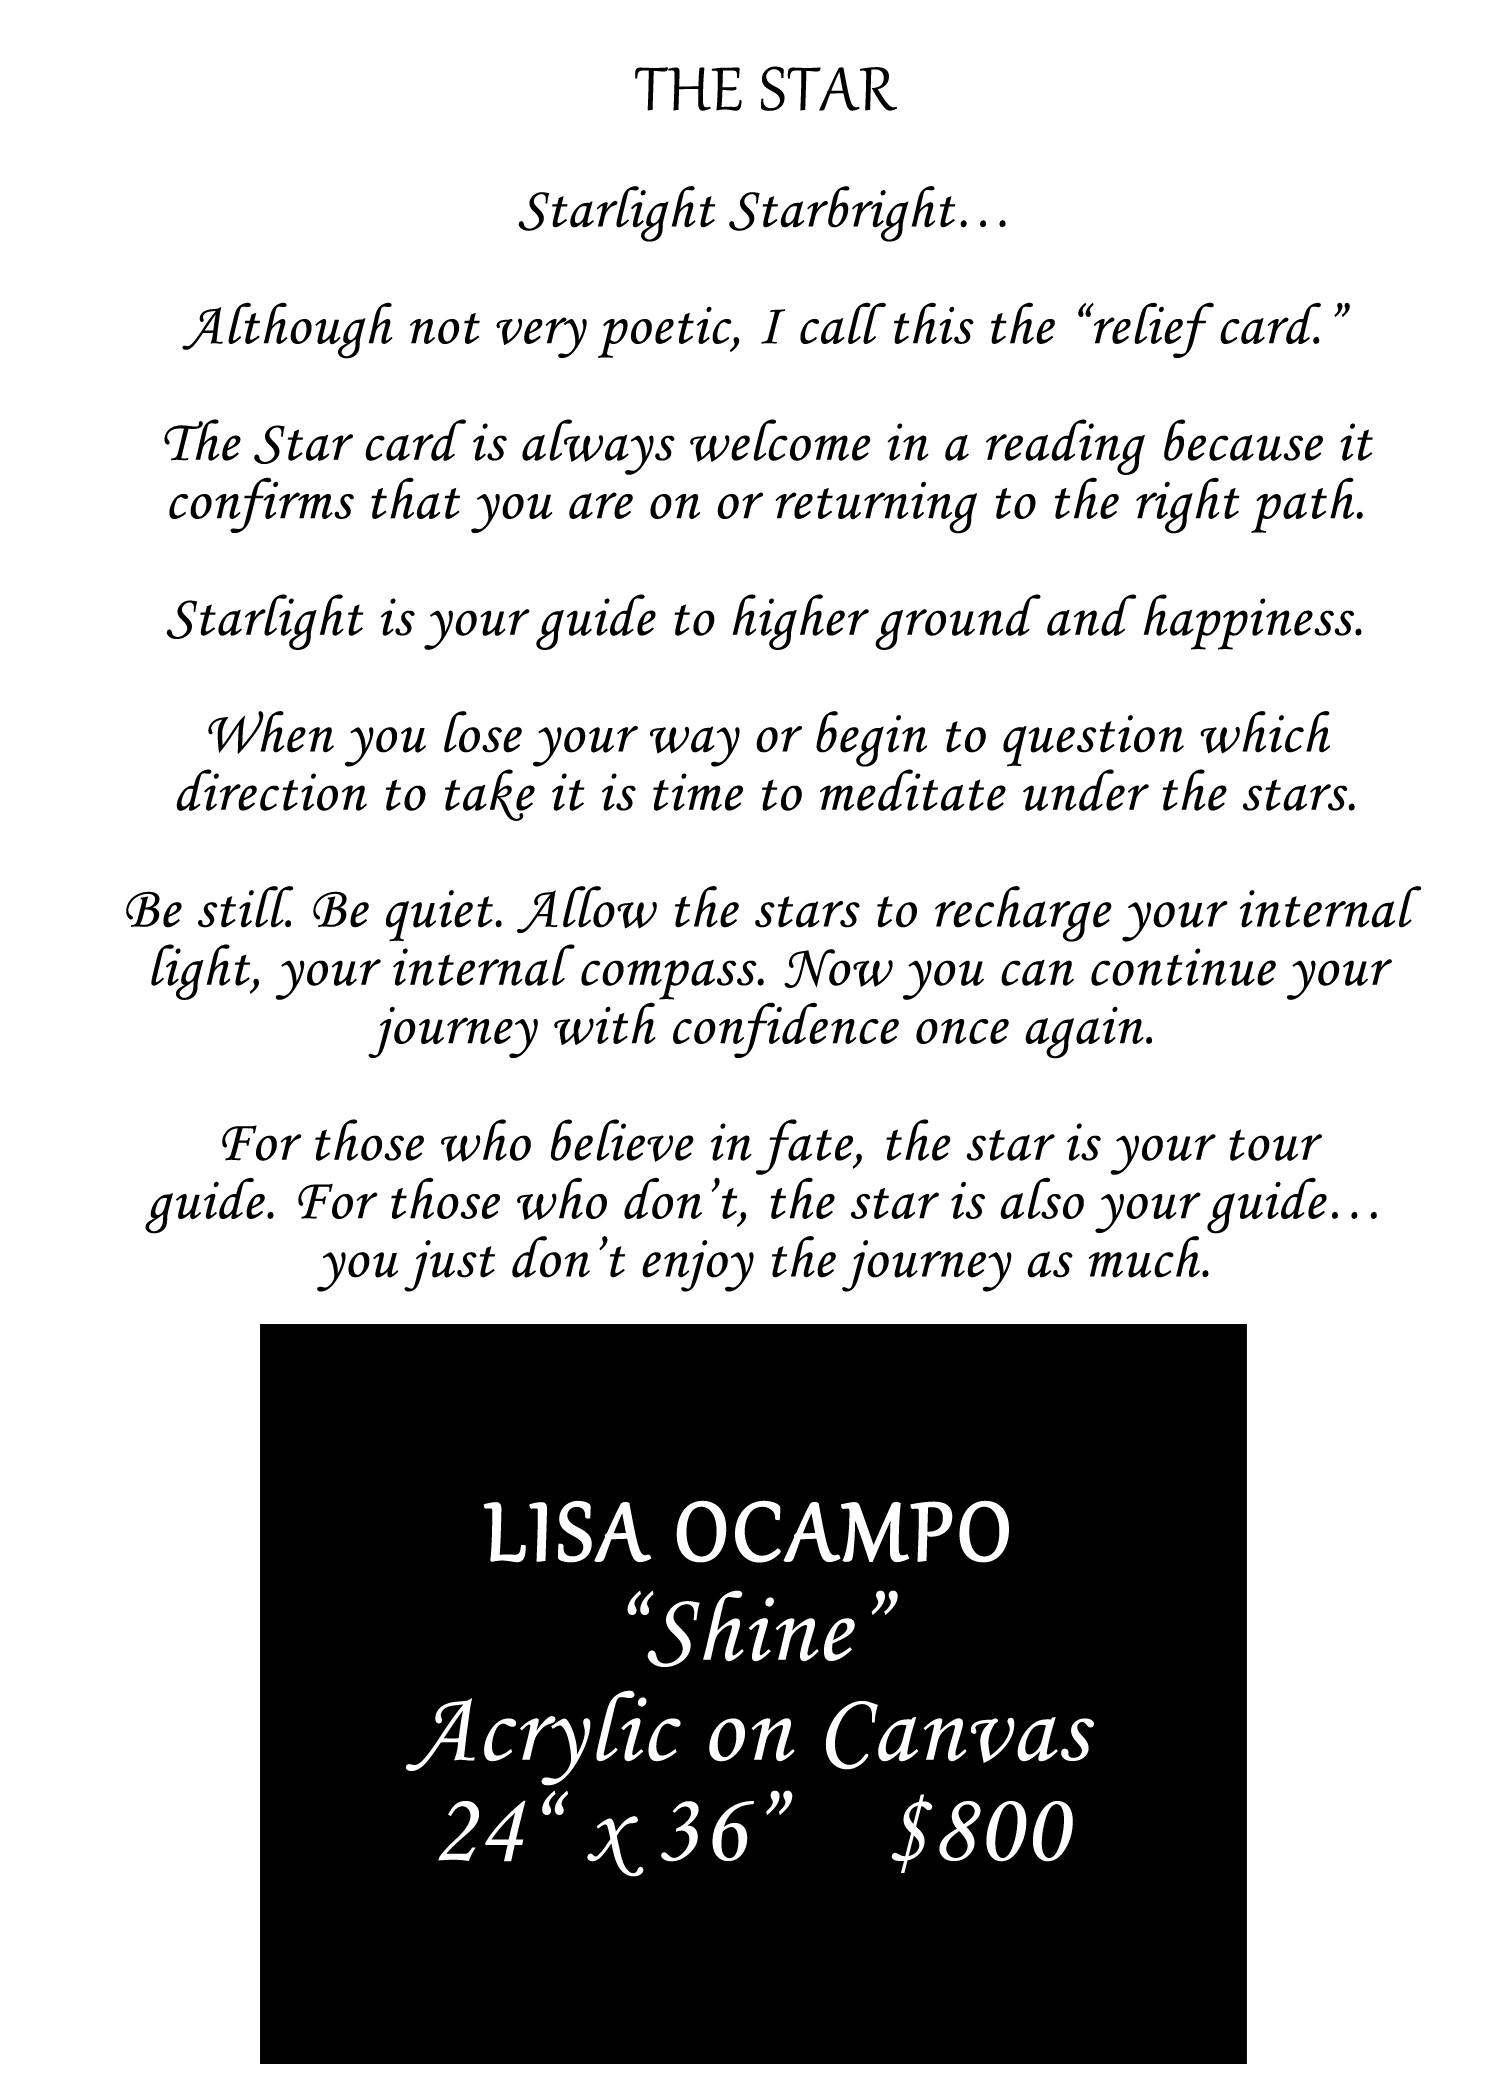 Lisa-Ocampo-Shine-The-Star-12.jpg